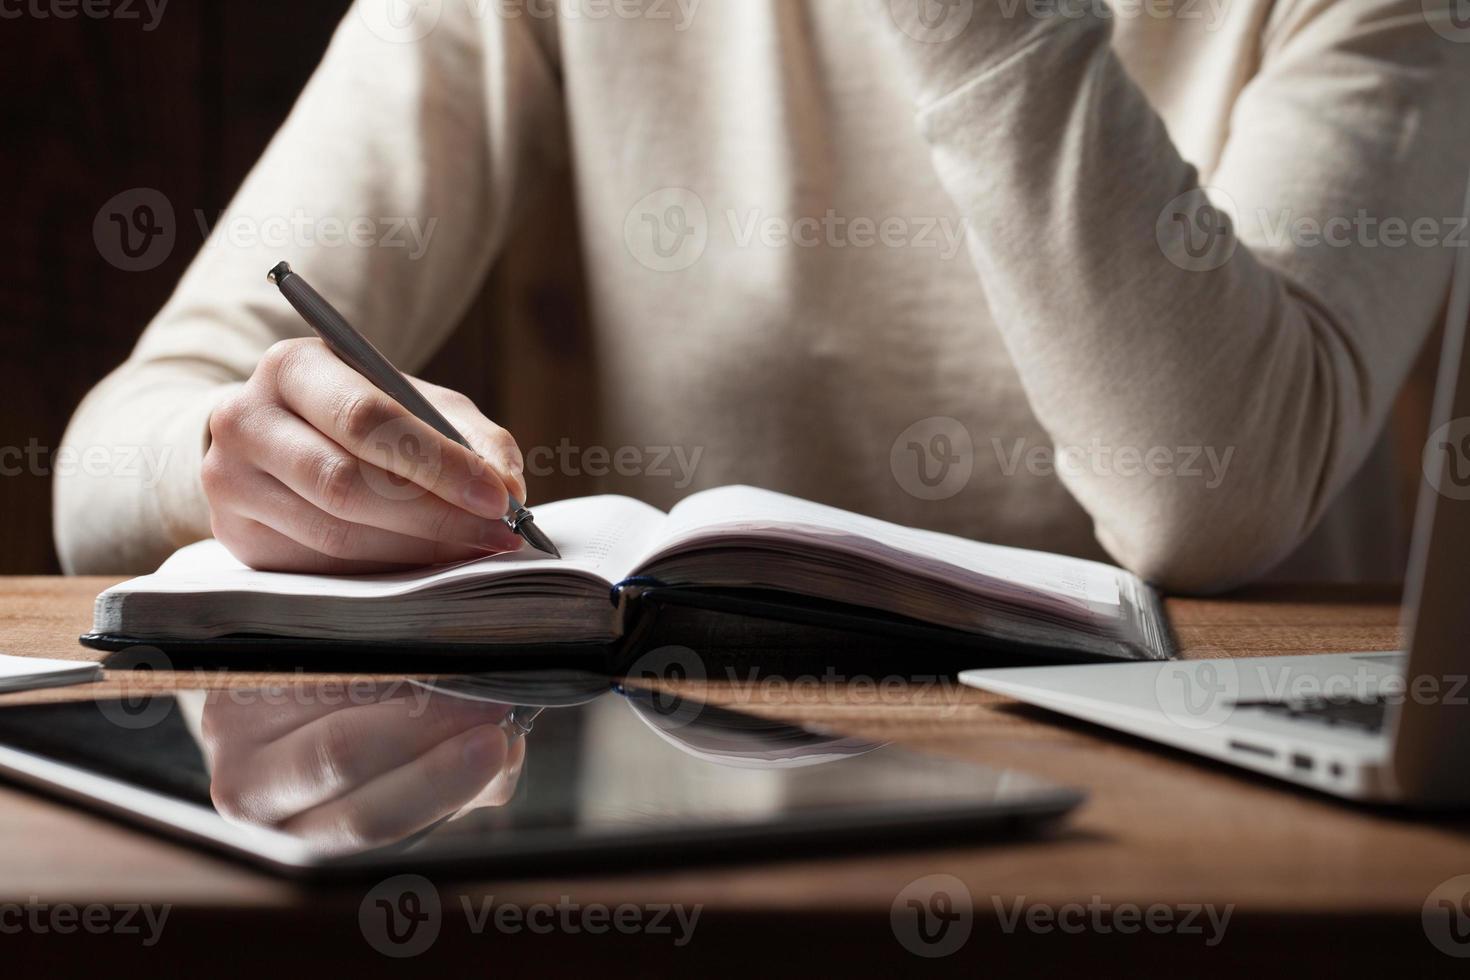 femme, mains, utilisation, ordinateur portable, bureau, bureau photo